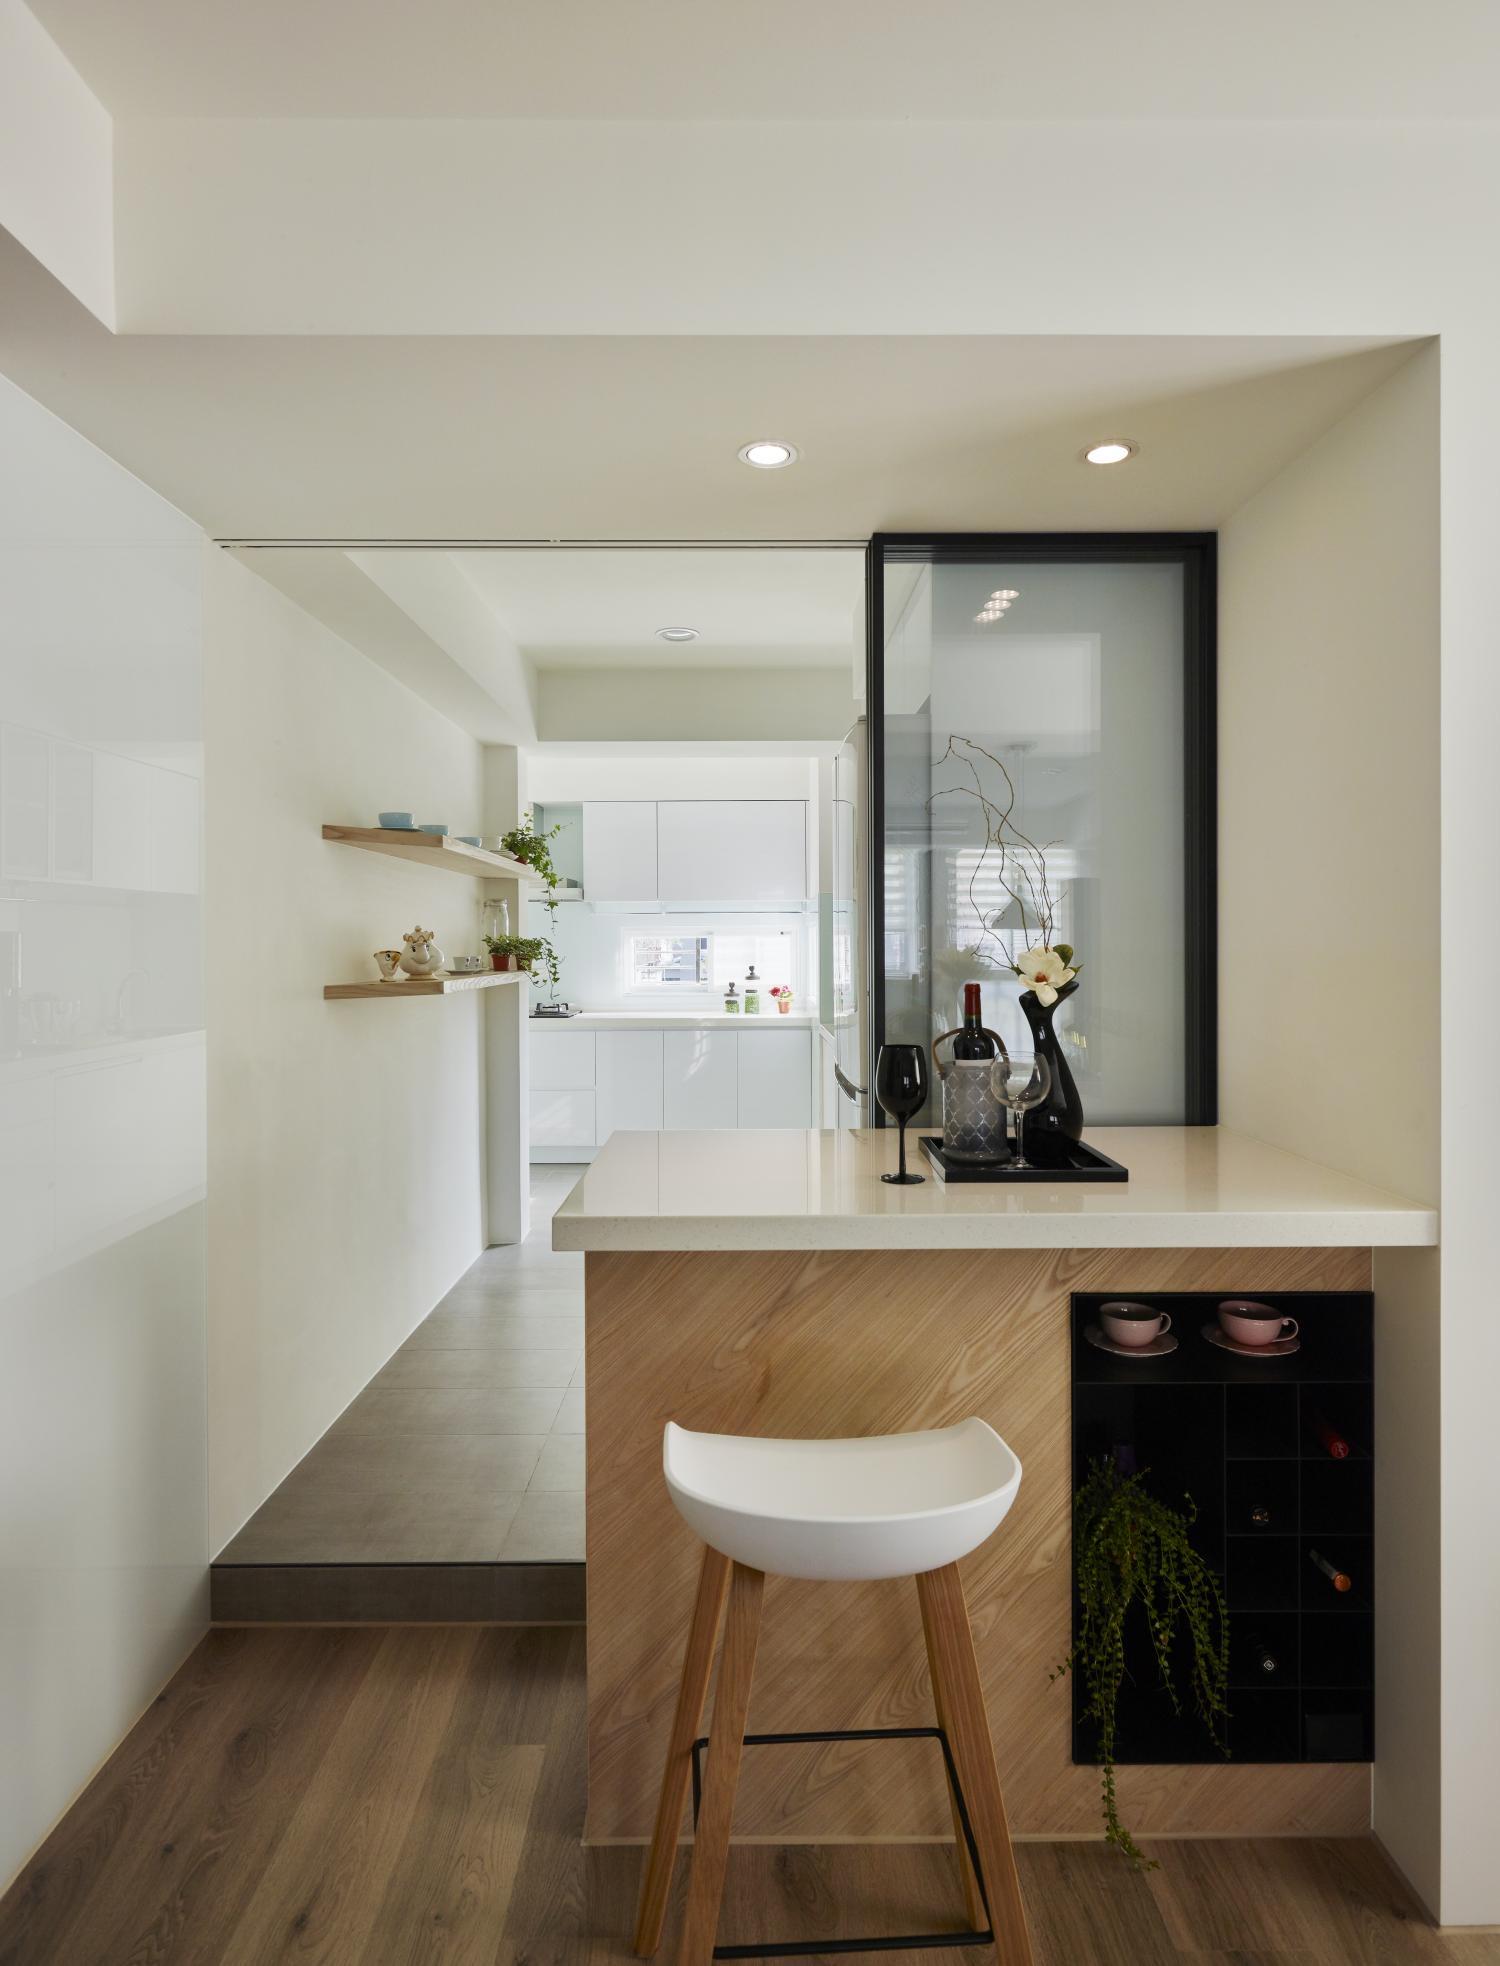 Interior Image 251